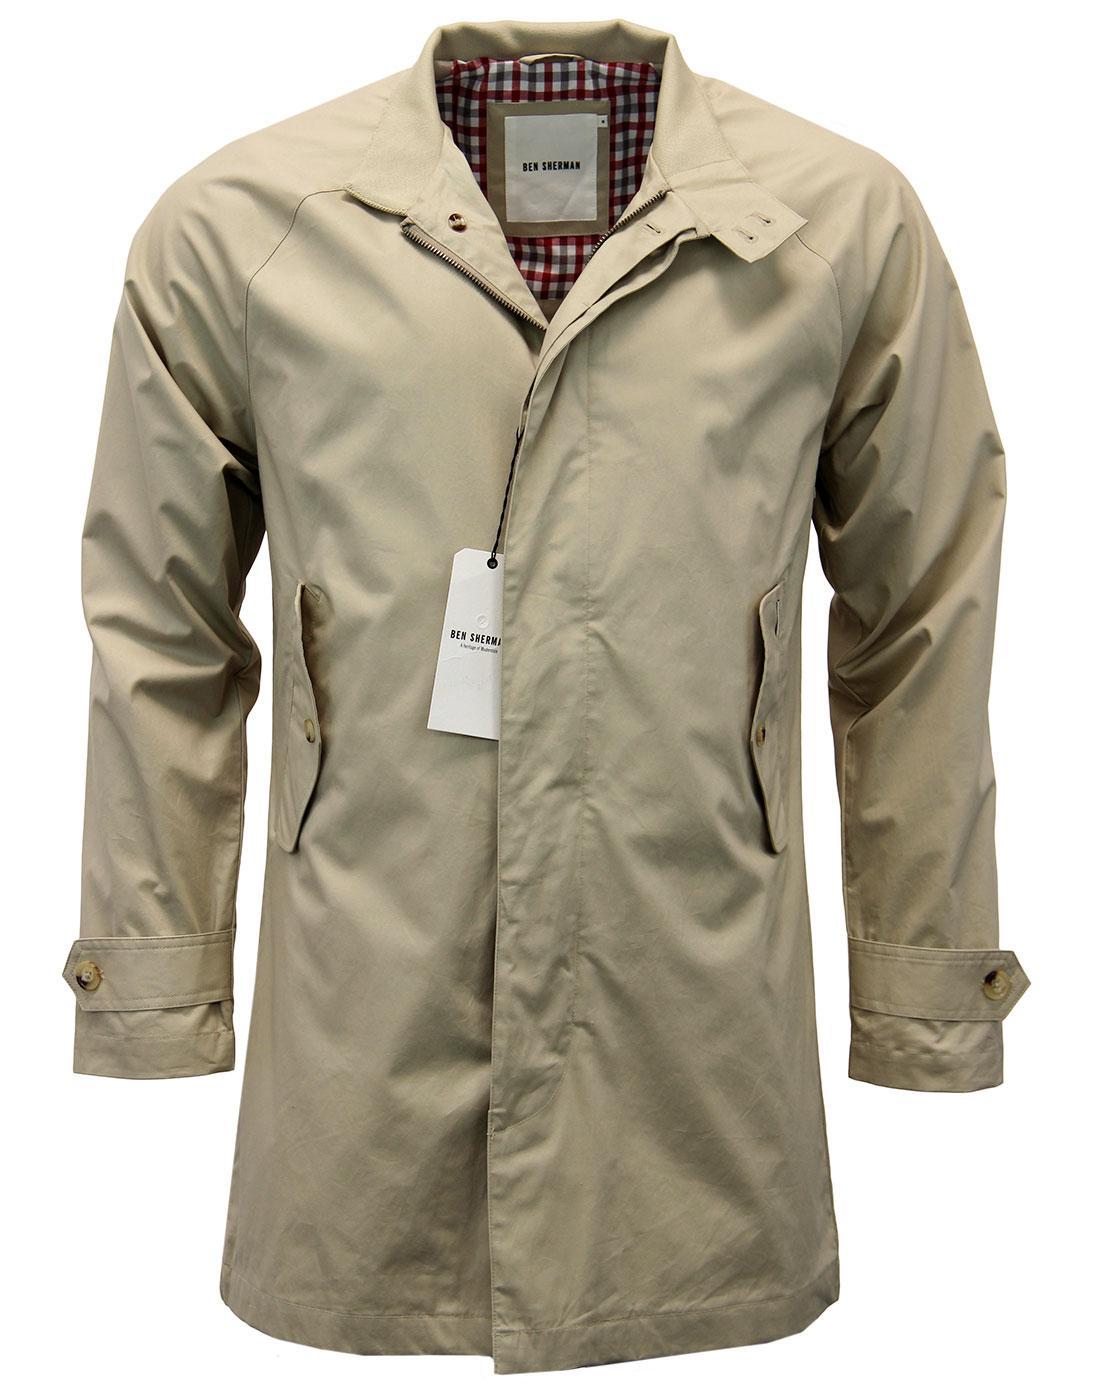 Harrymac Ben Sherman Retro 60s Mod Mac Jacket (M)